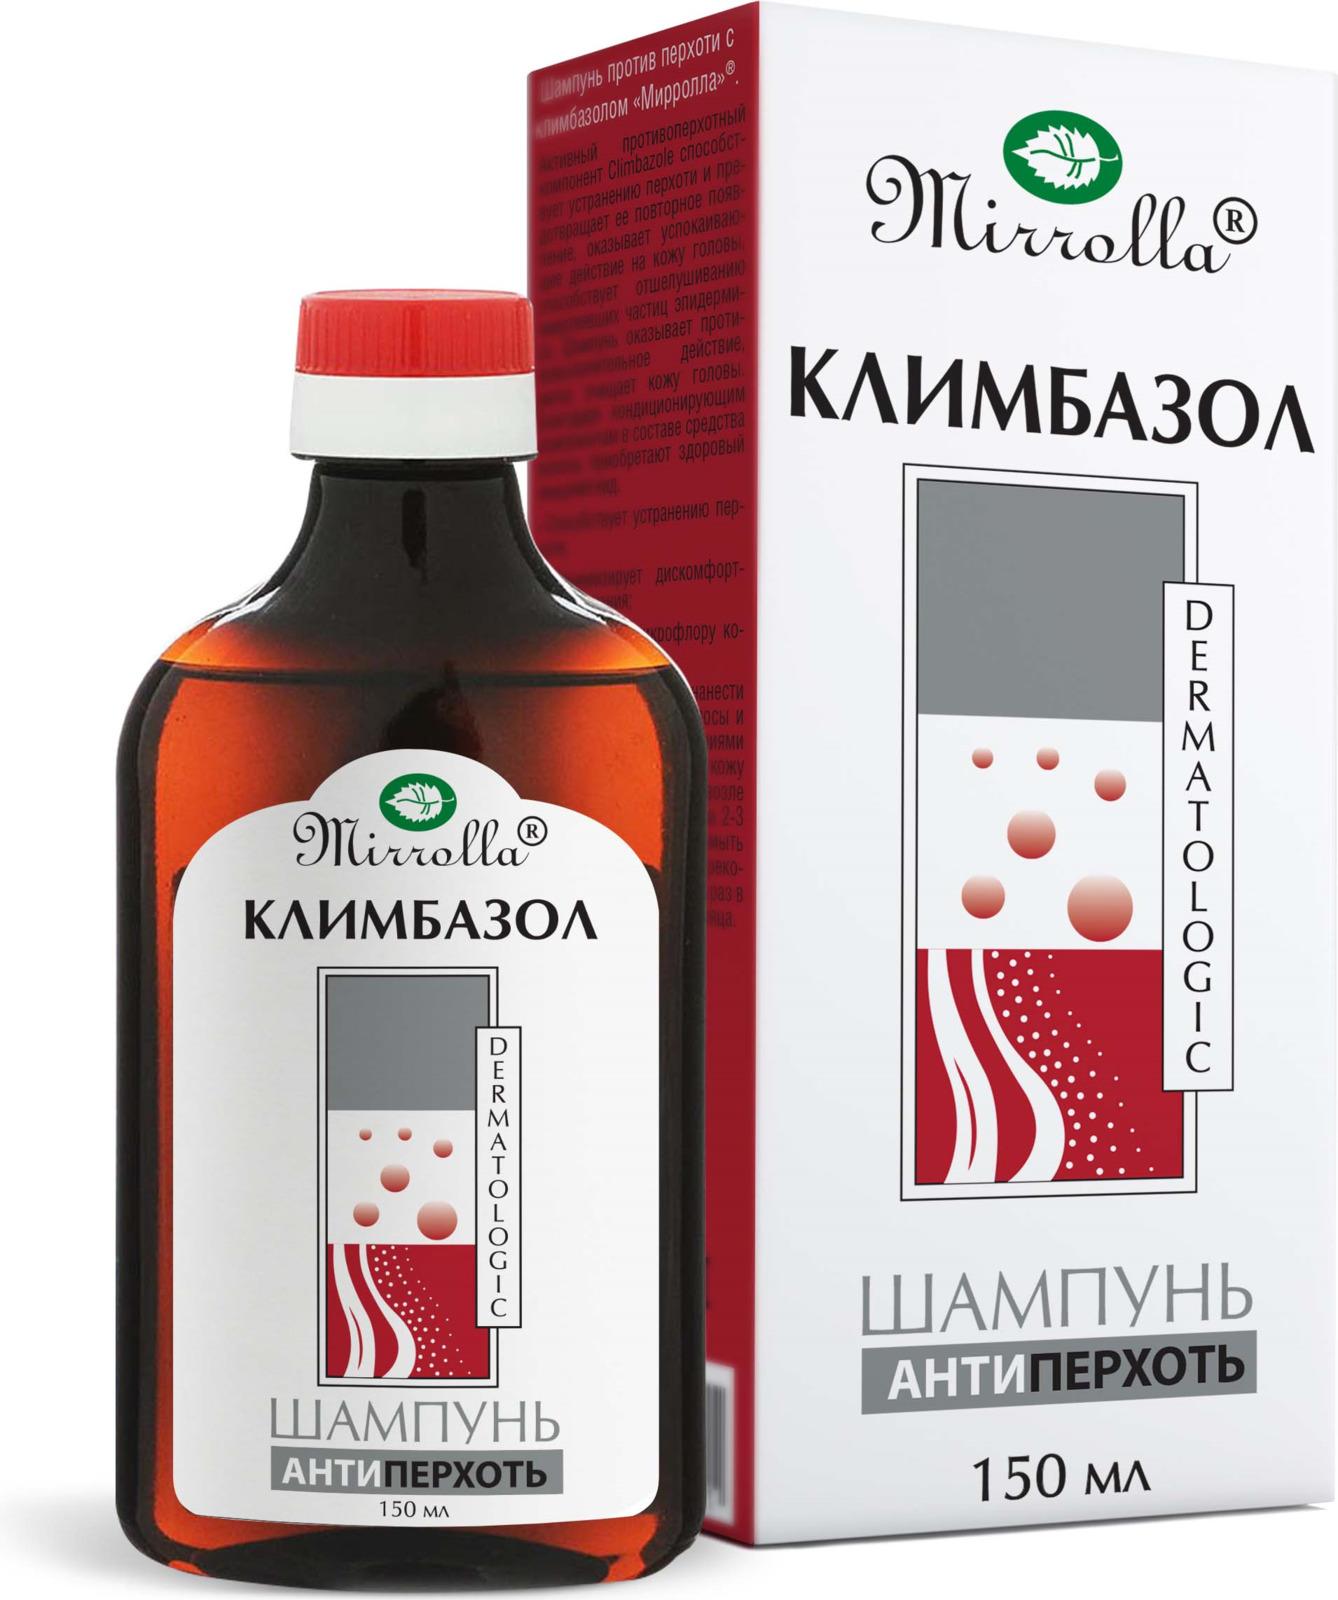 Мирролла Шампунь от перхоти Mirrolla® с климбазолом 2% 150 мл мирролла сульсен форте шампунь с климбазолом против перхоти 250мл